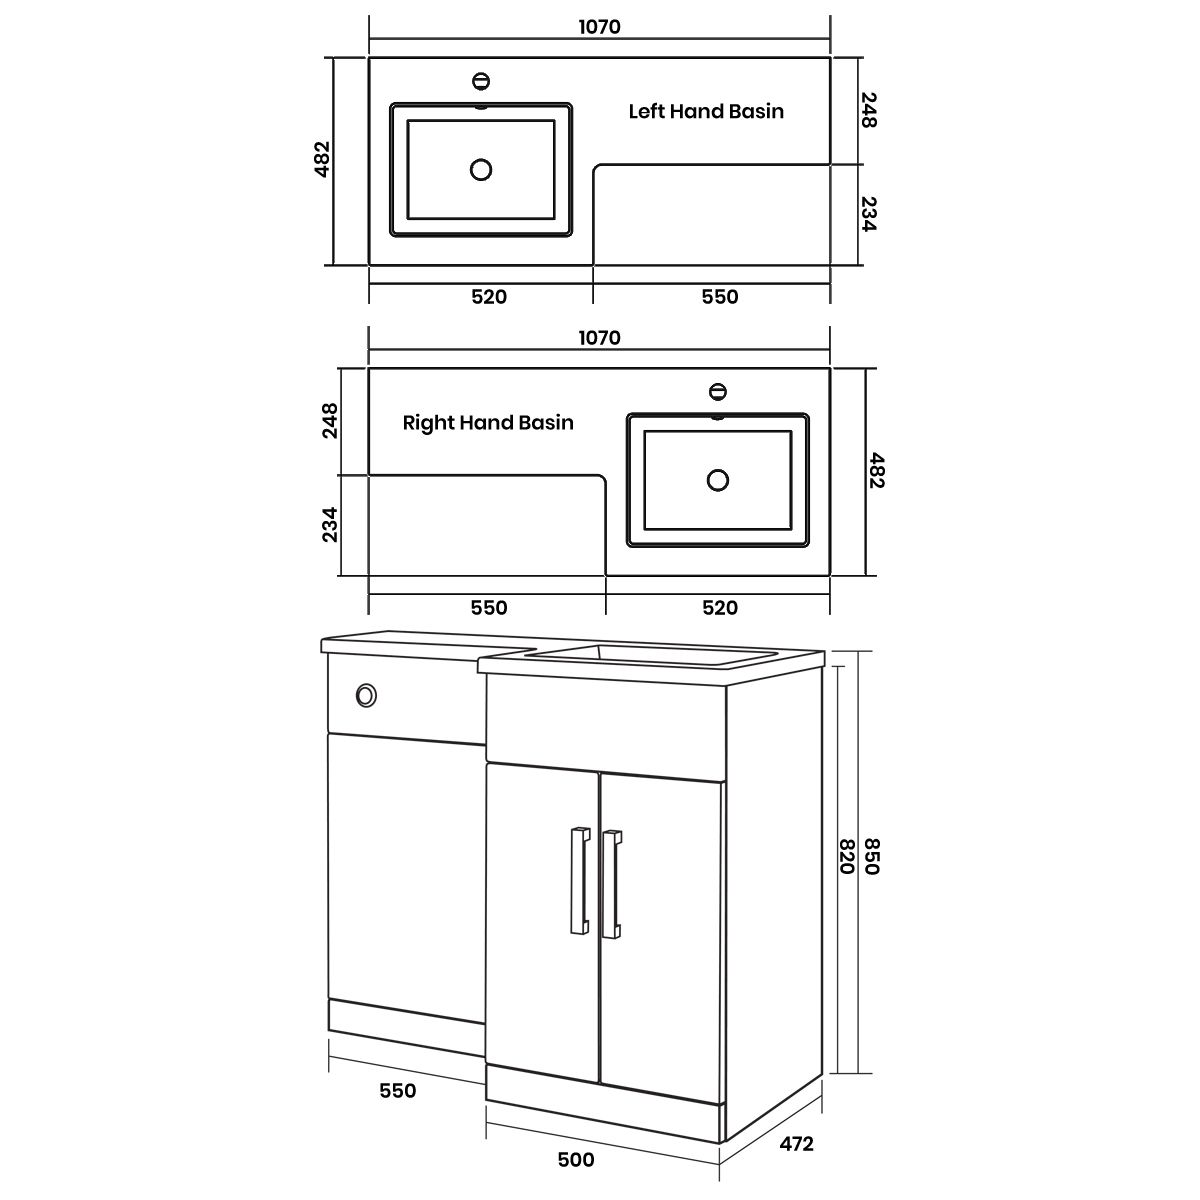 Elation Combination L Shape Indigo Matt Furniture Pack 1070mm Dimensions